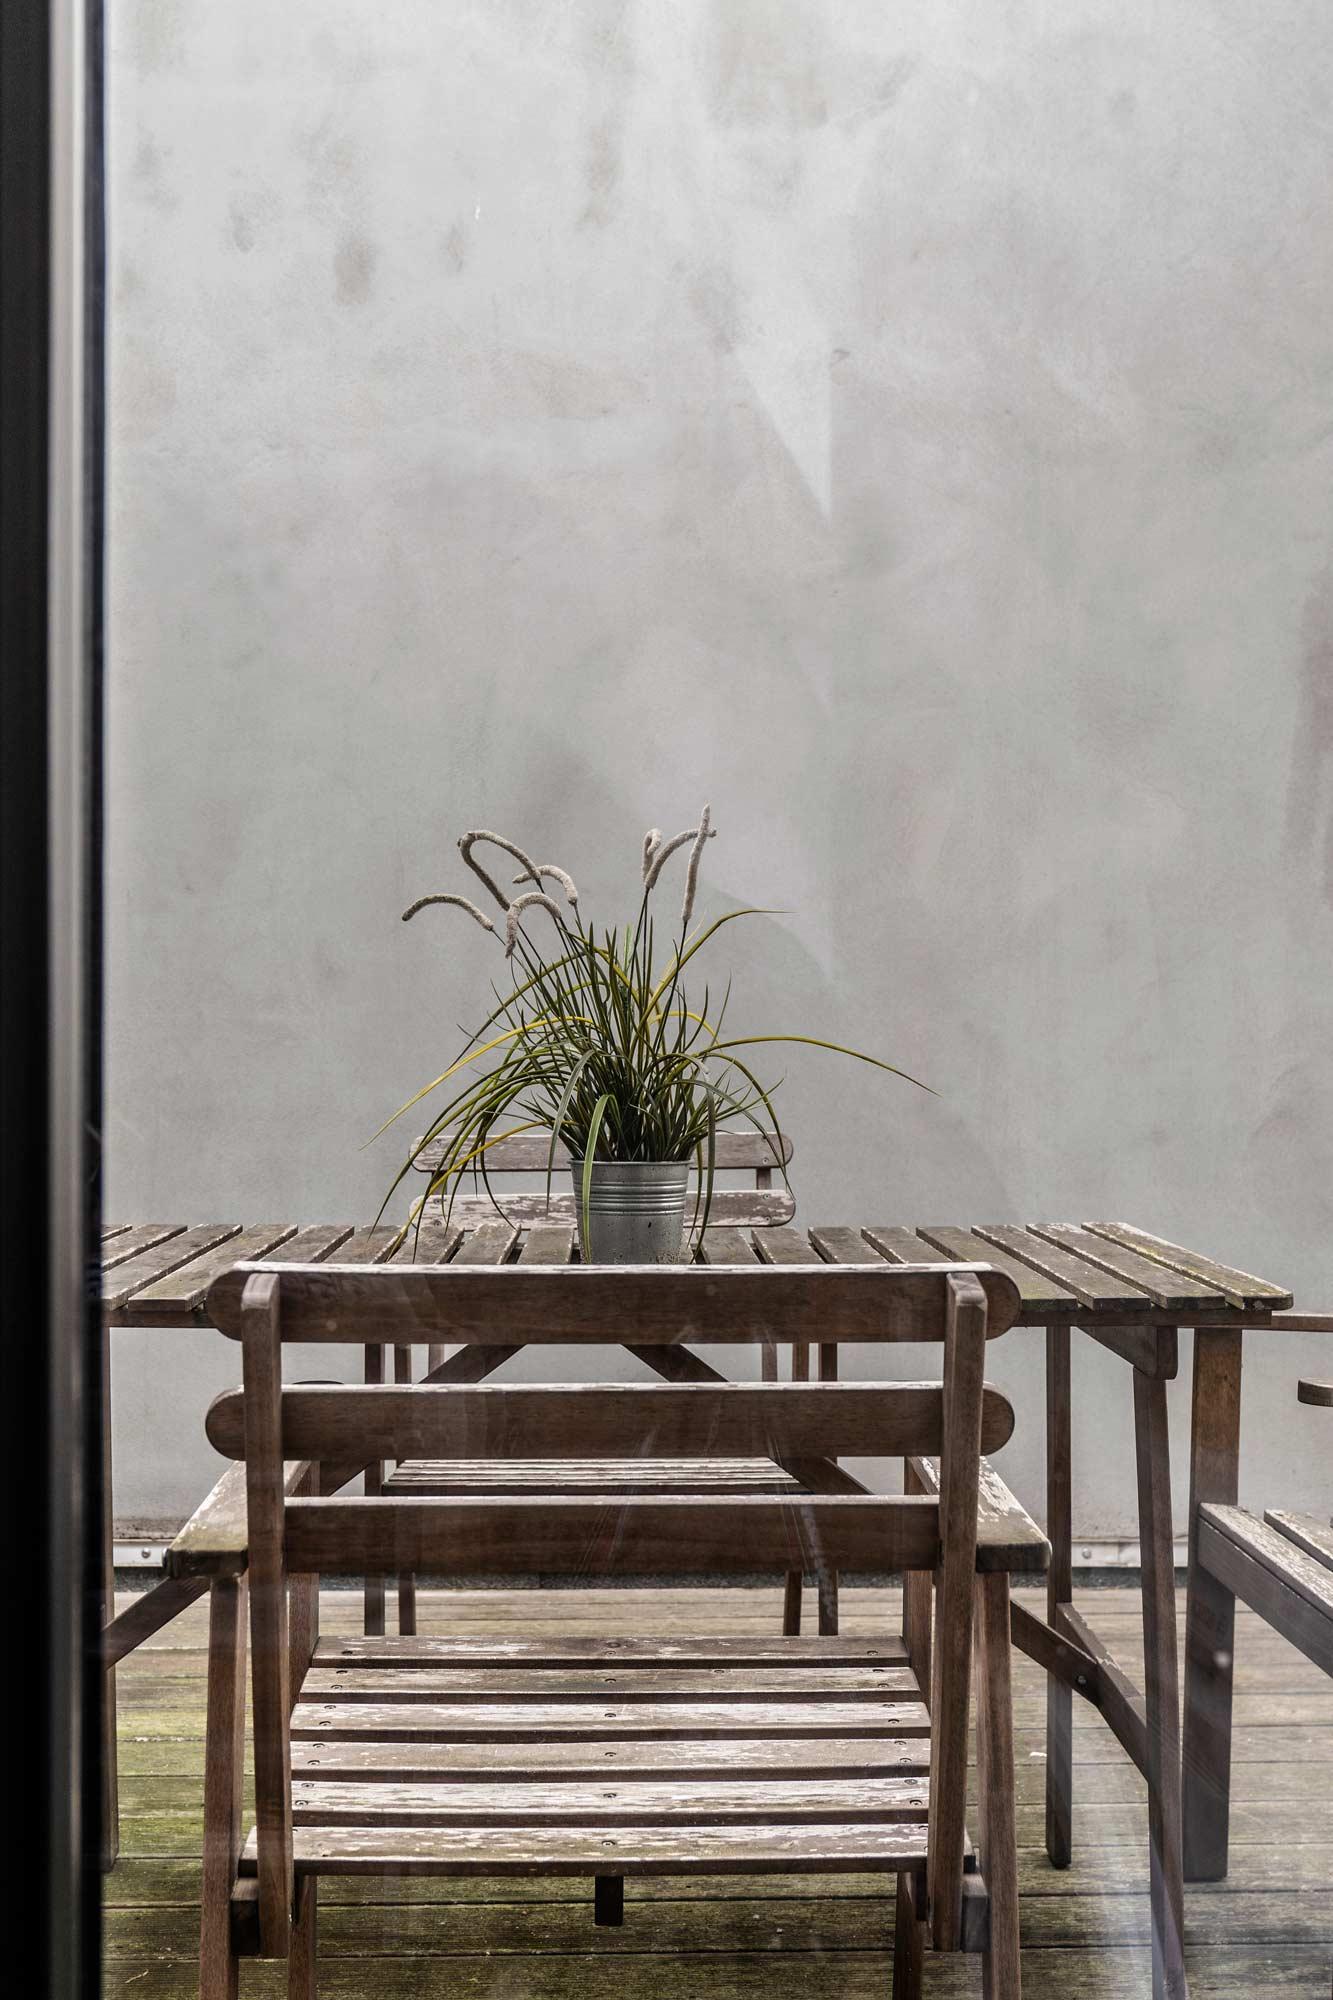 Terrace - Interview with Homemadestudio - Soonafternoon